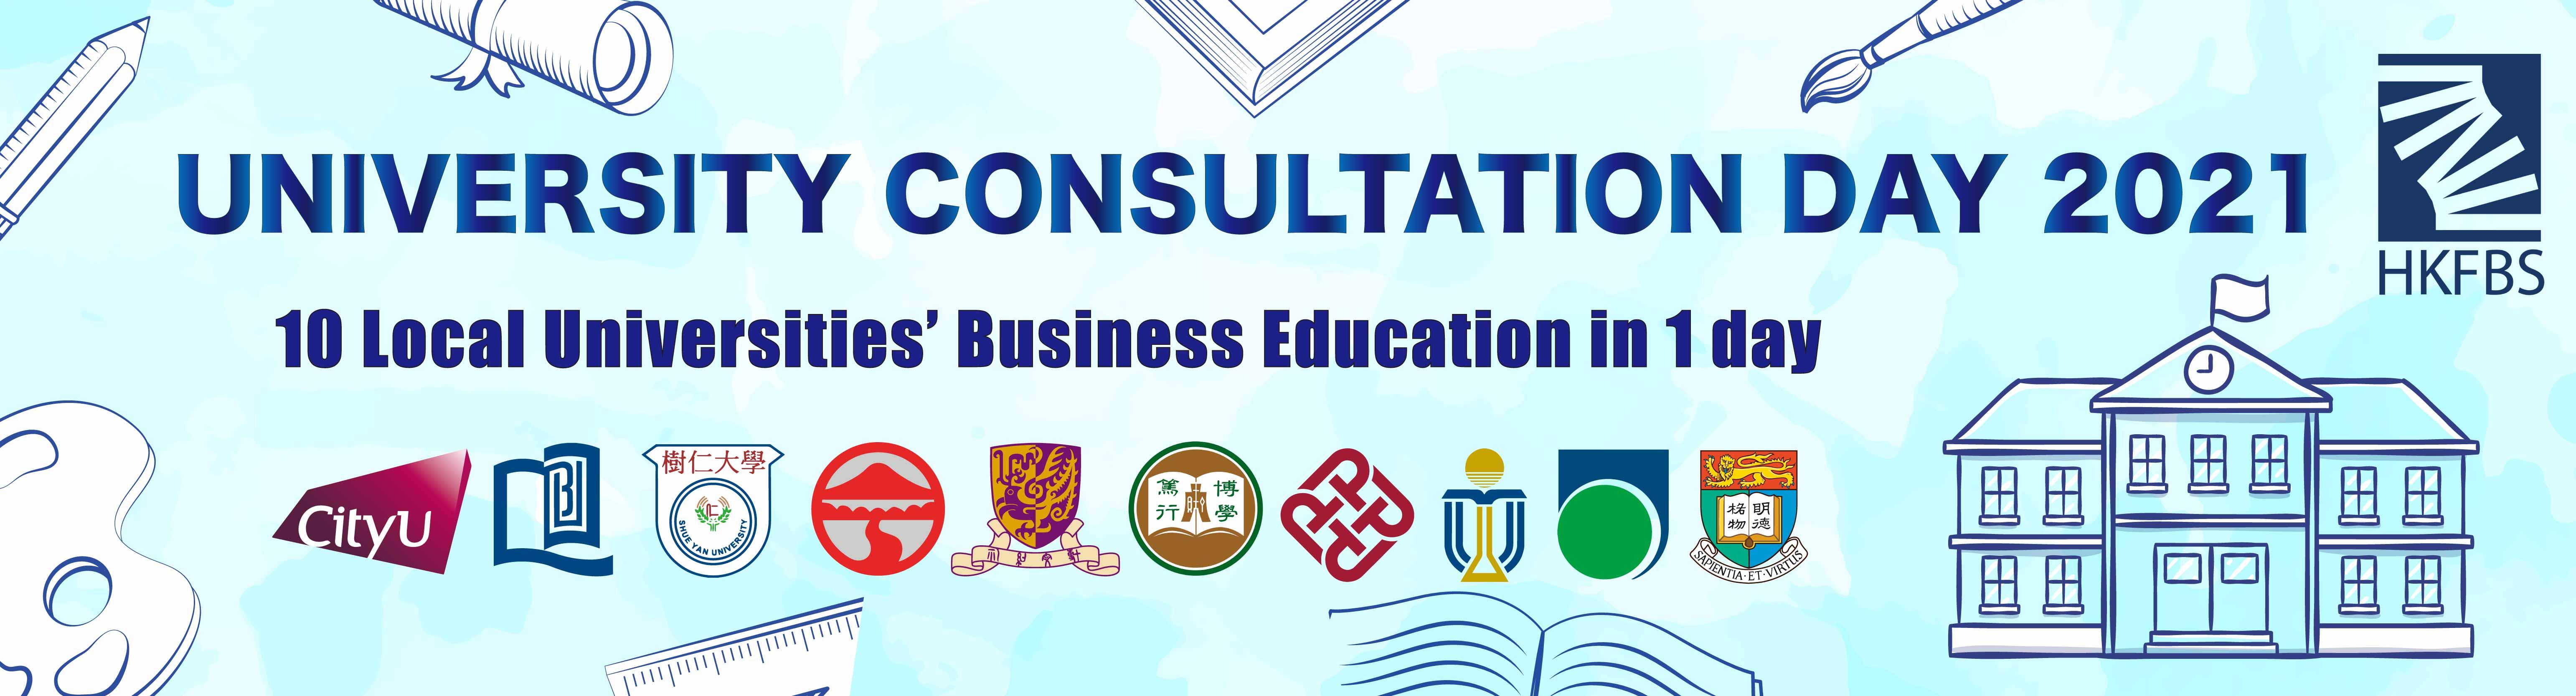 University Consultation Day 2021